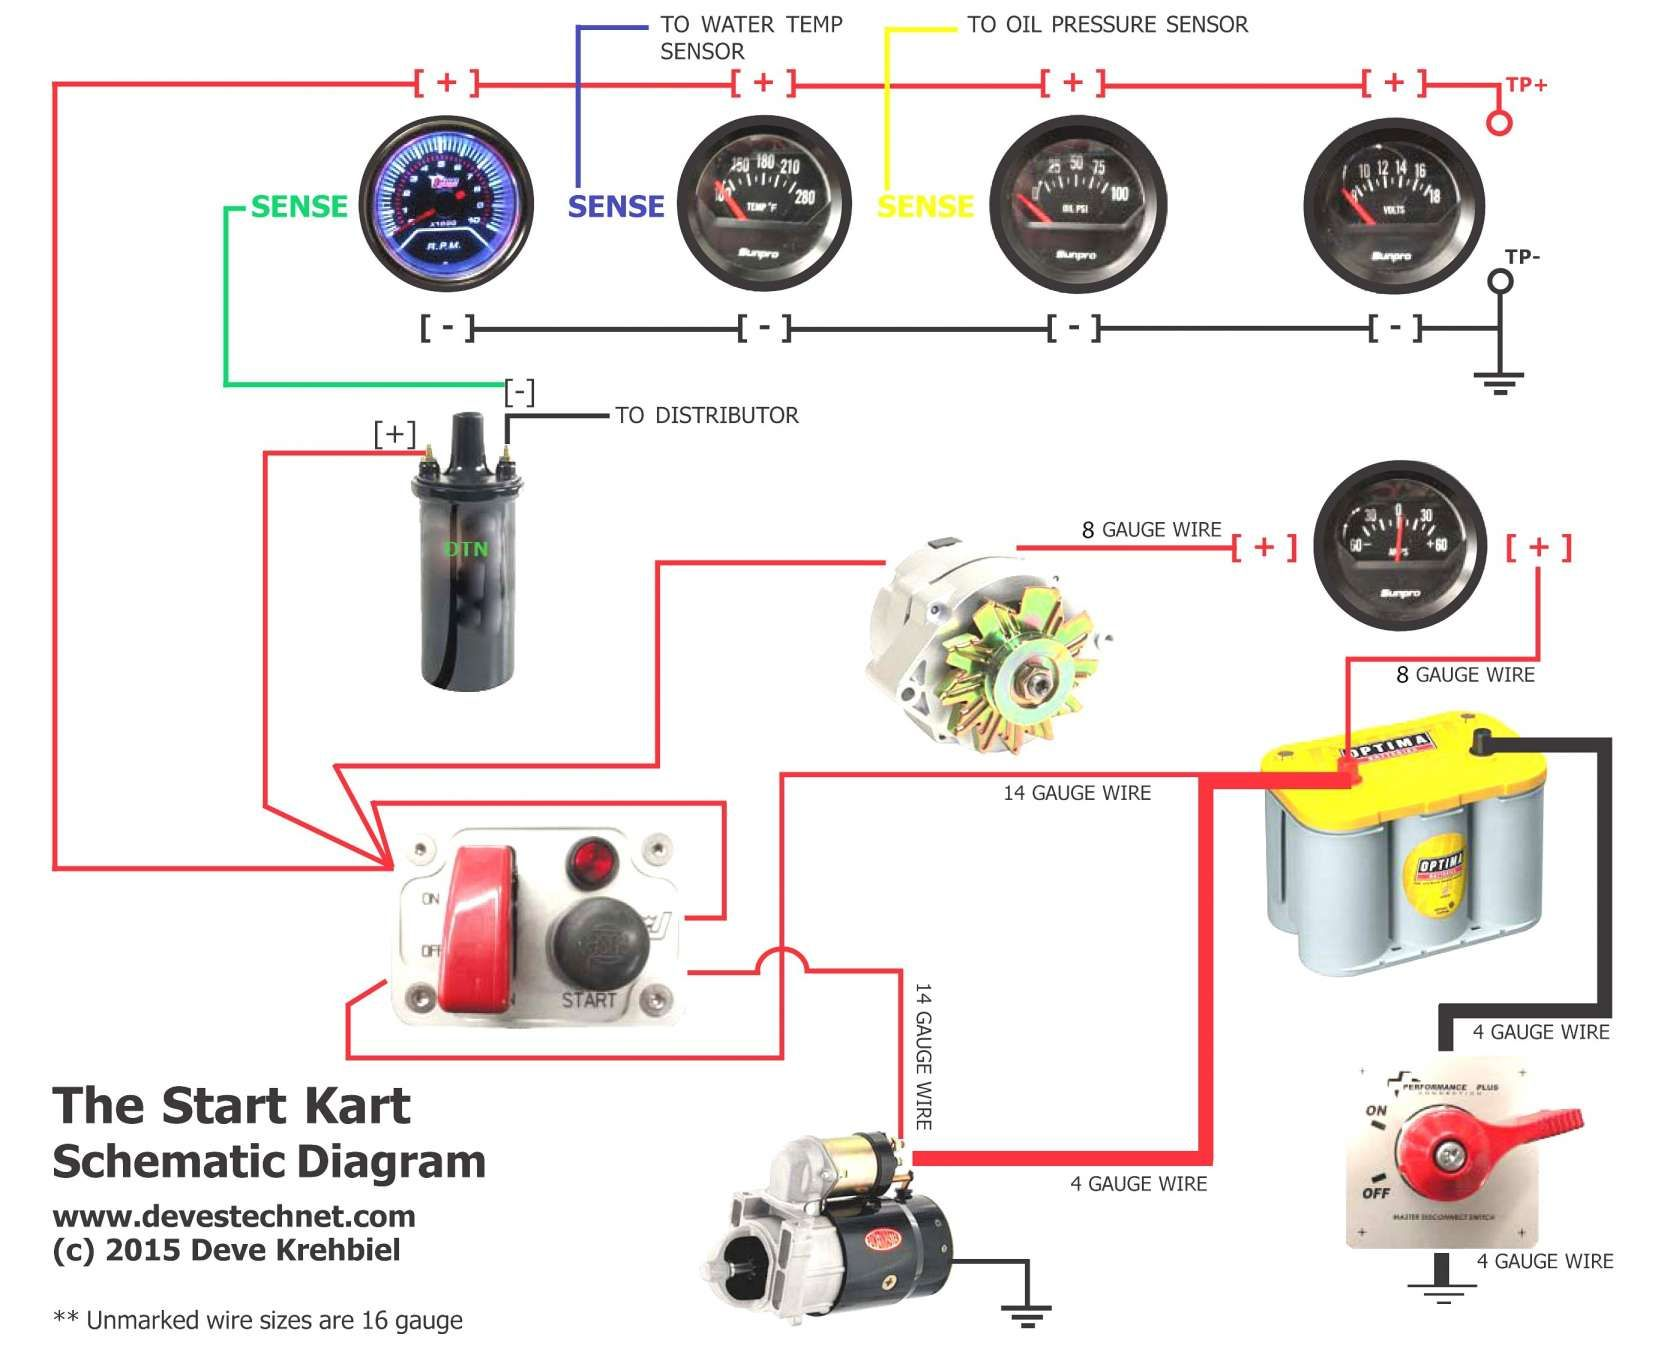 17 Quick Car Gauge Wiring Diagramquick Car Gauge Wiring Diagram Car Diagram Wiringg Net Car Gauges Engine Stand Electrical Diagram